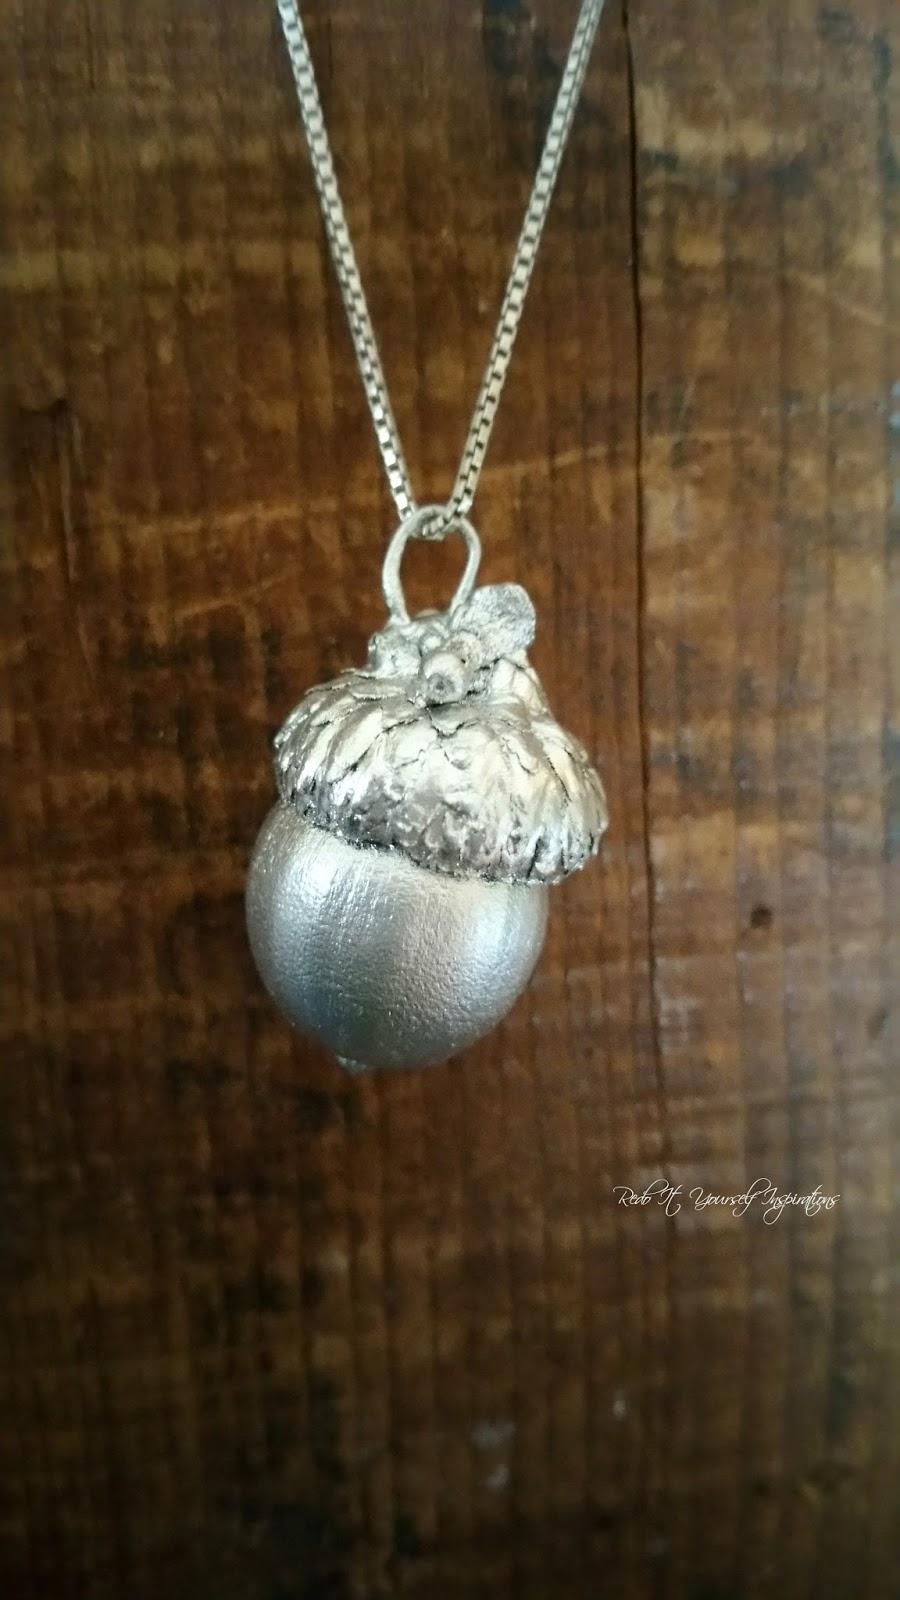 Diy acorn pendant redo it yourself inspirations diy for Acorn necklace craft